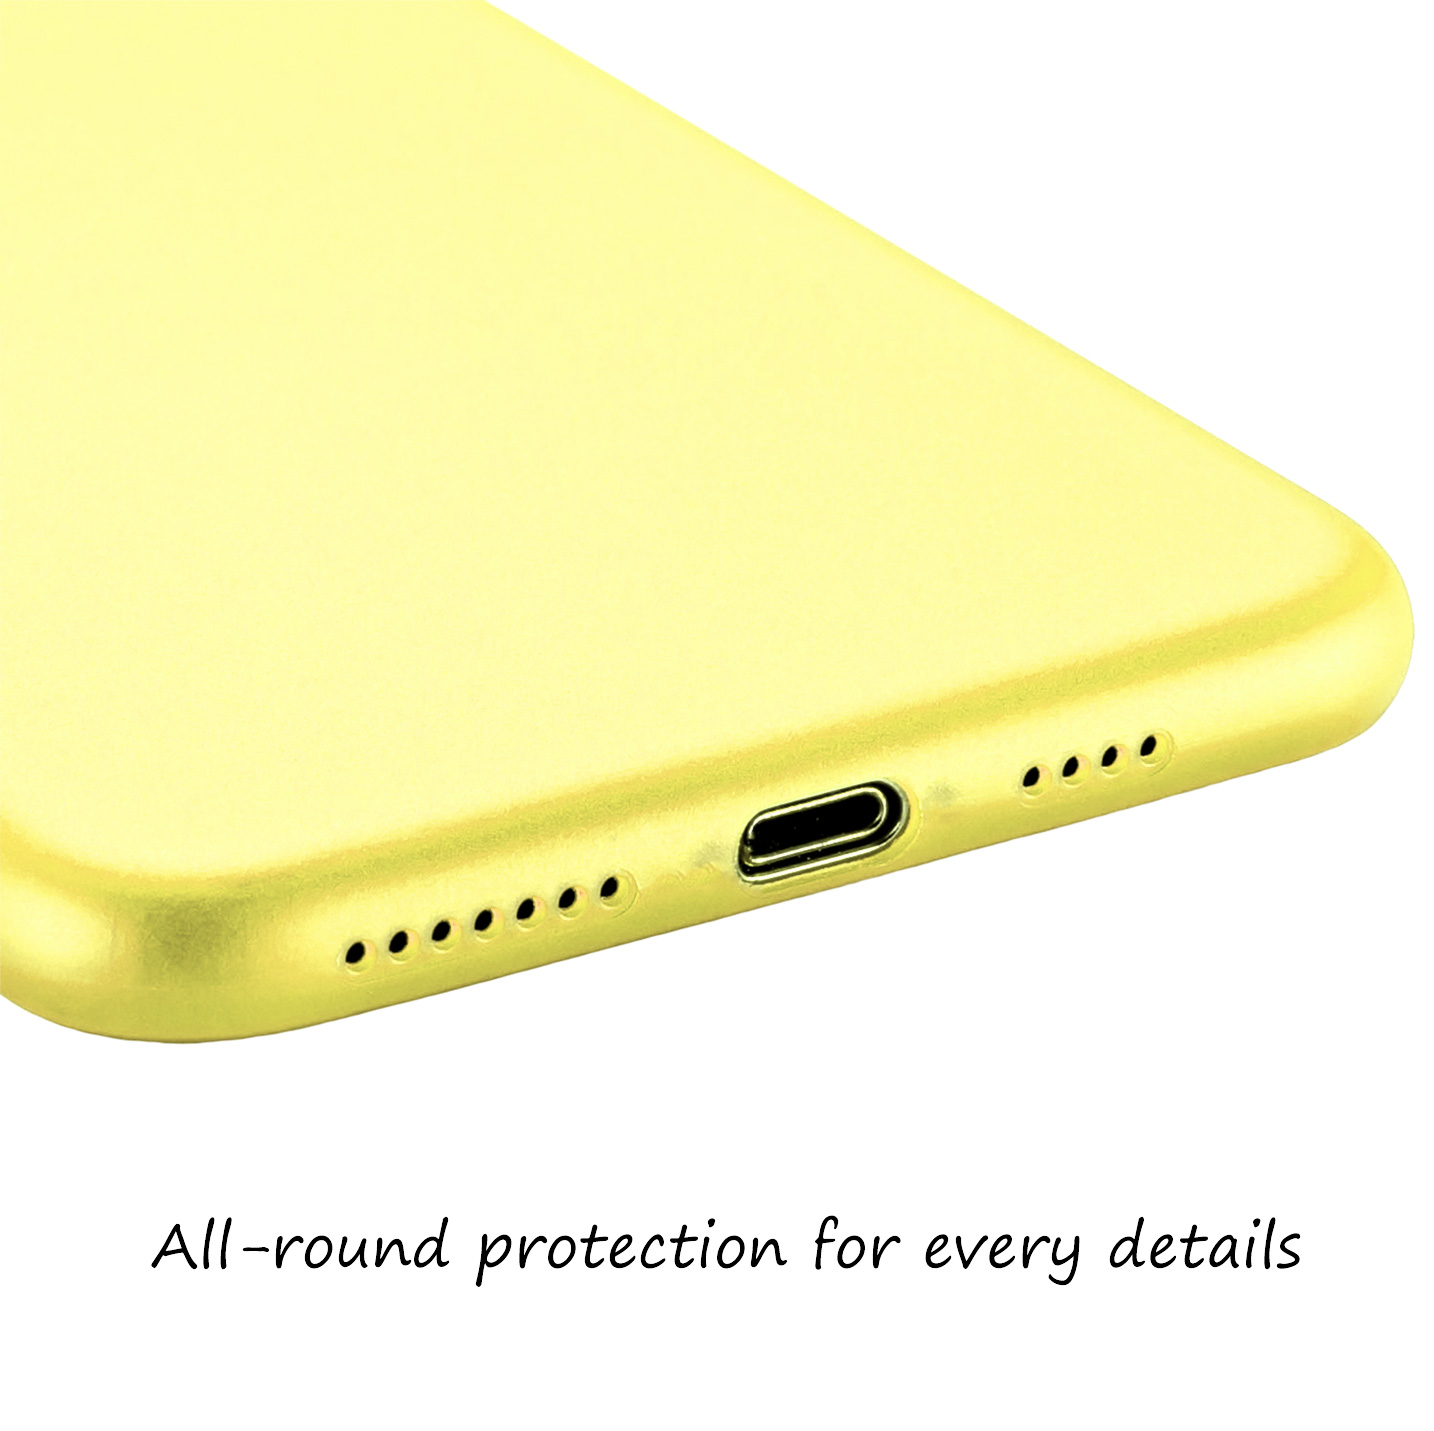 Ultra-Slim-Case-iPhone-11-Pro-5-8-034-Matt-Clear-Schutz-Huelle-Skin-Cover-Etui-Folie Indexbild 36